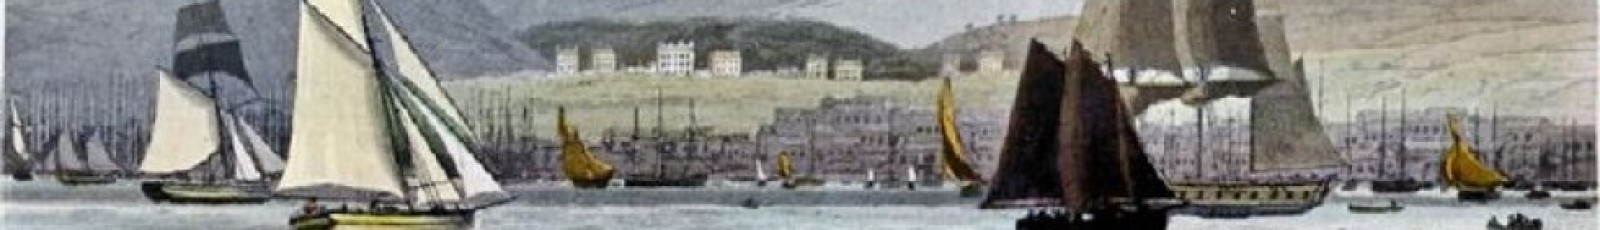 cropped-cropped-greenock-boats.jpg